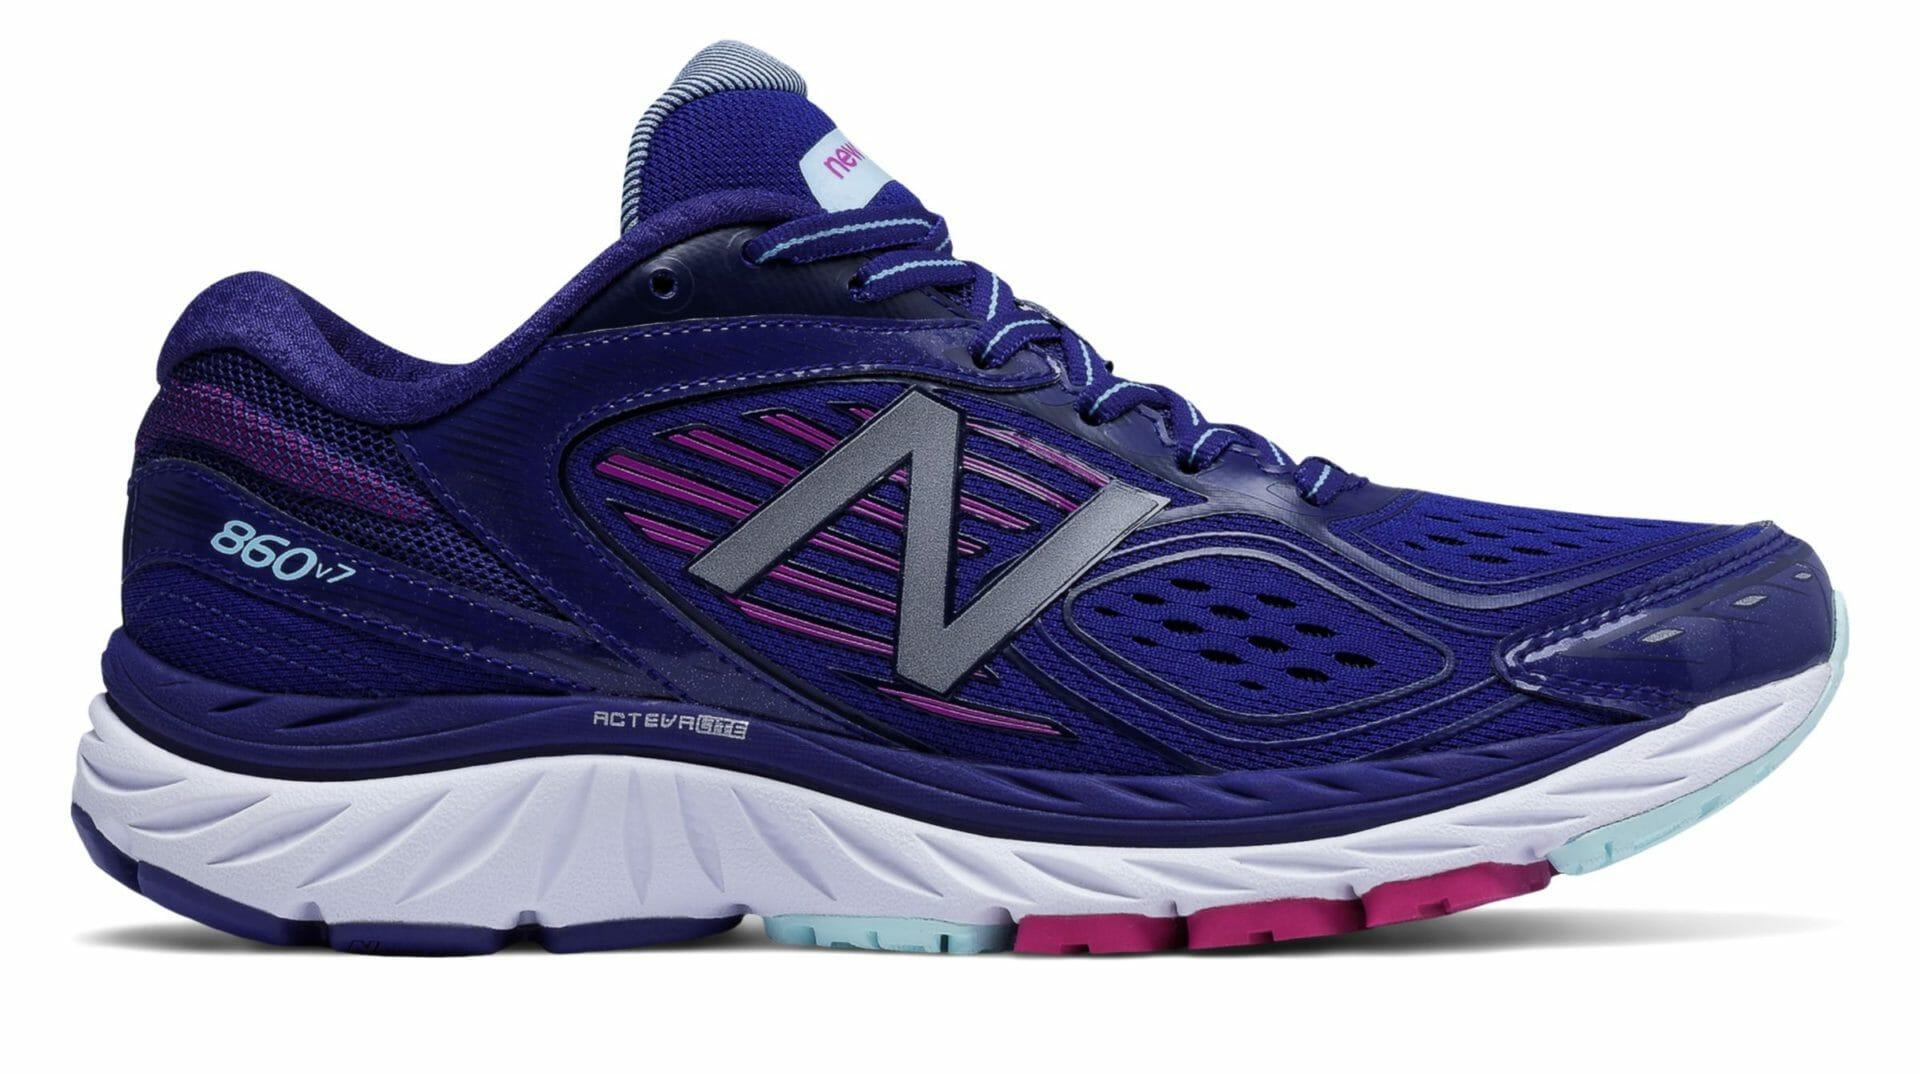 New Balance 860v7 Women's Running Shoes W860BP7